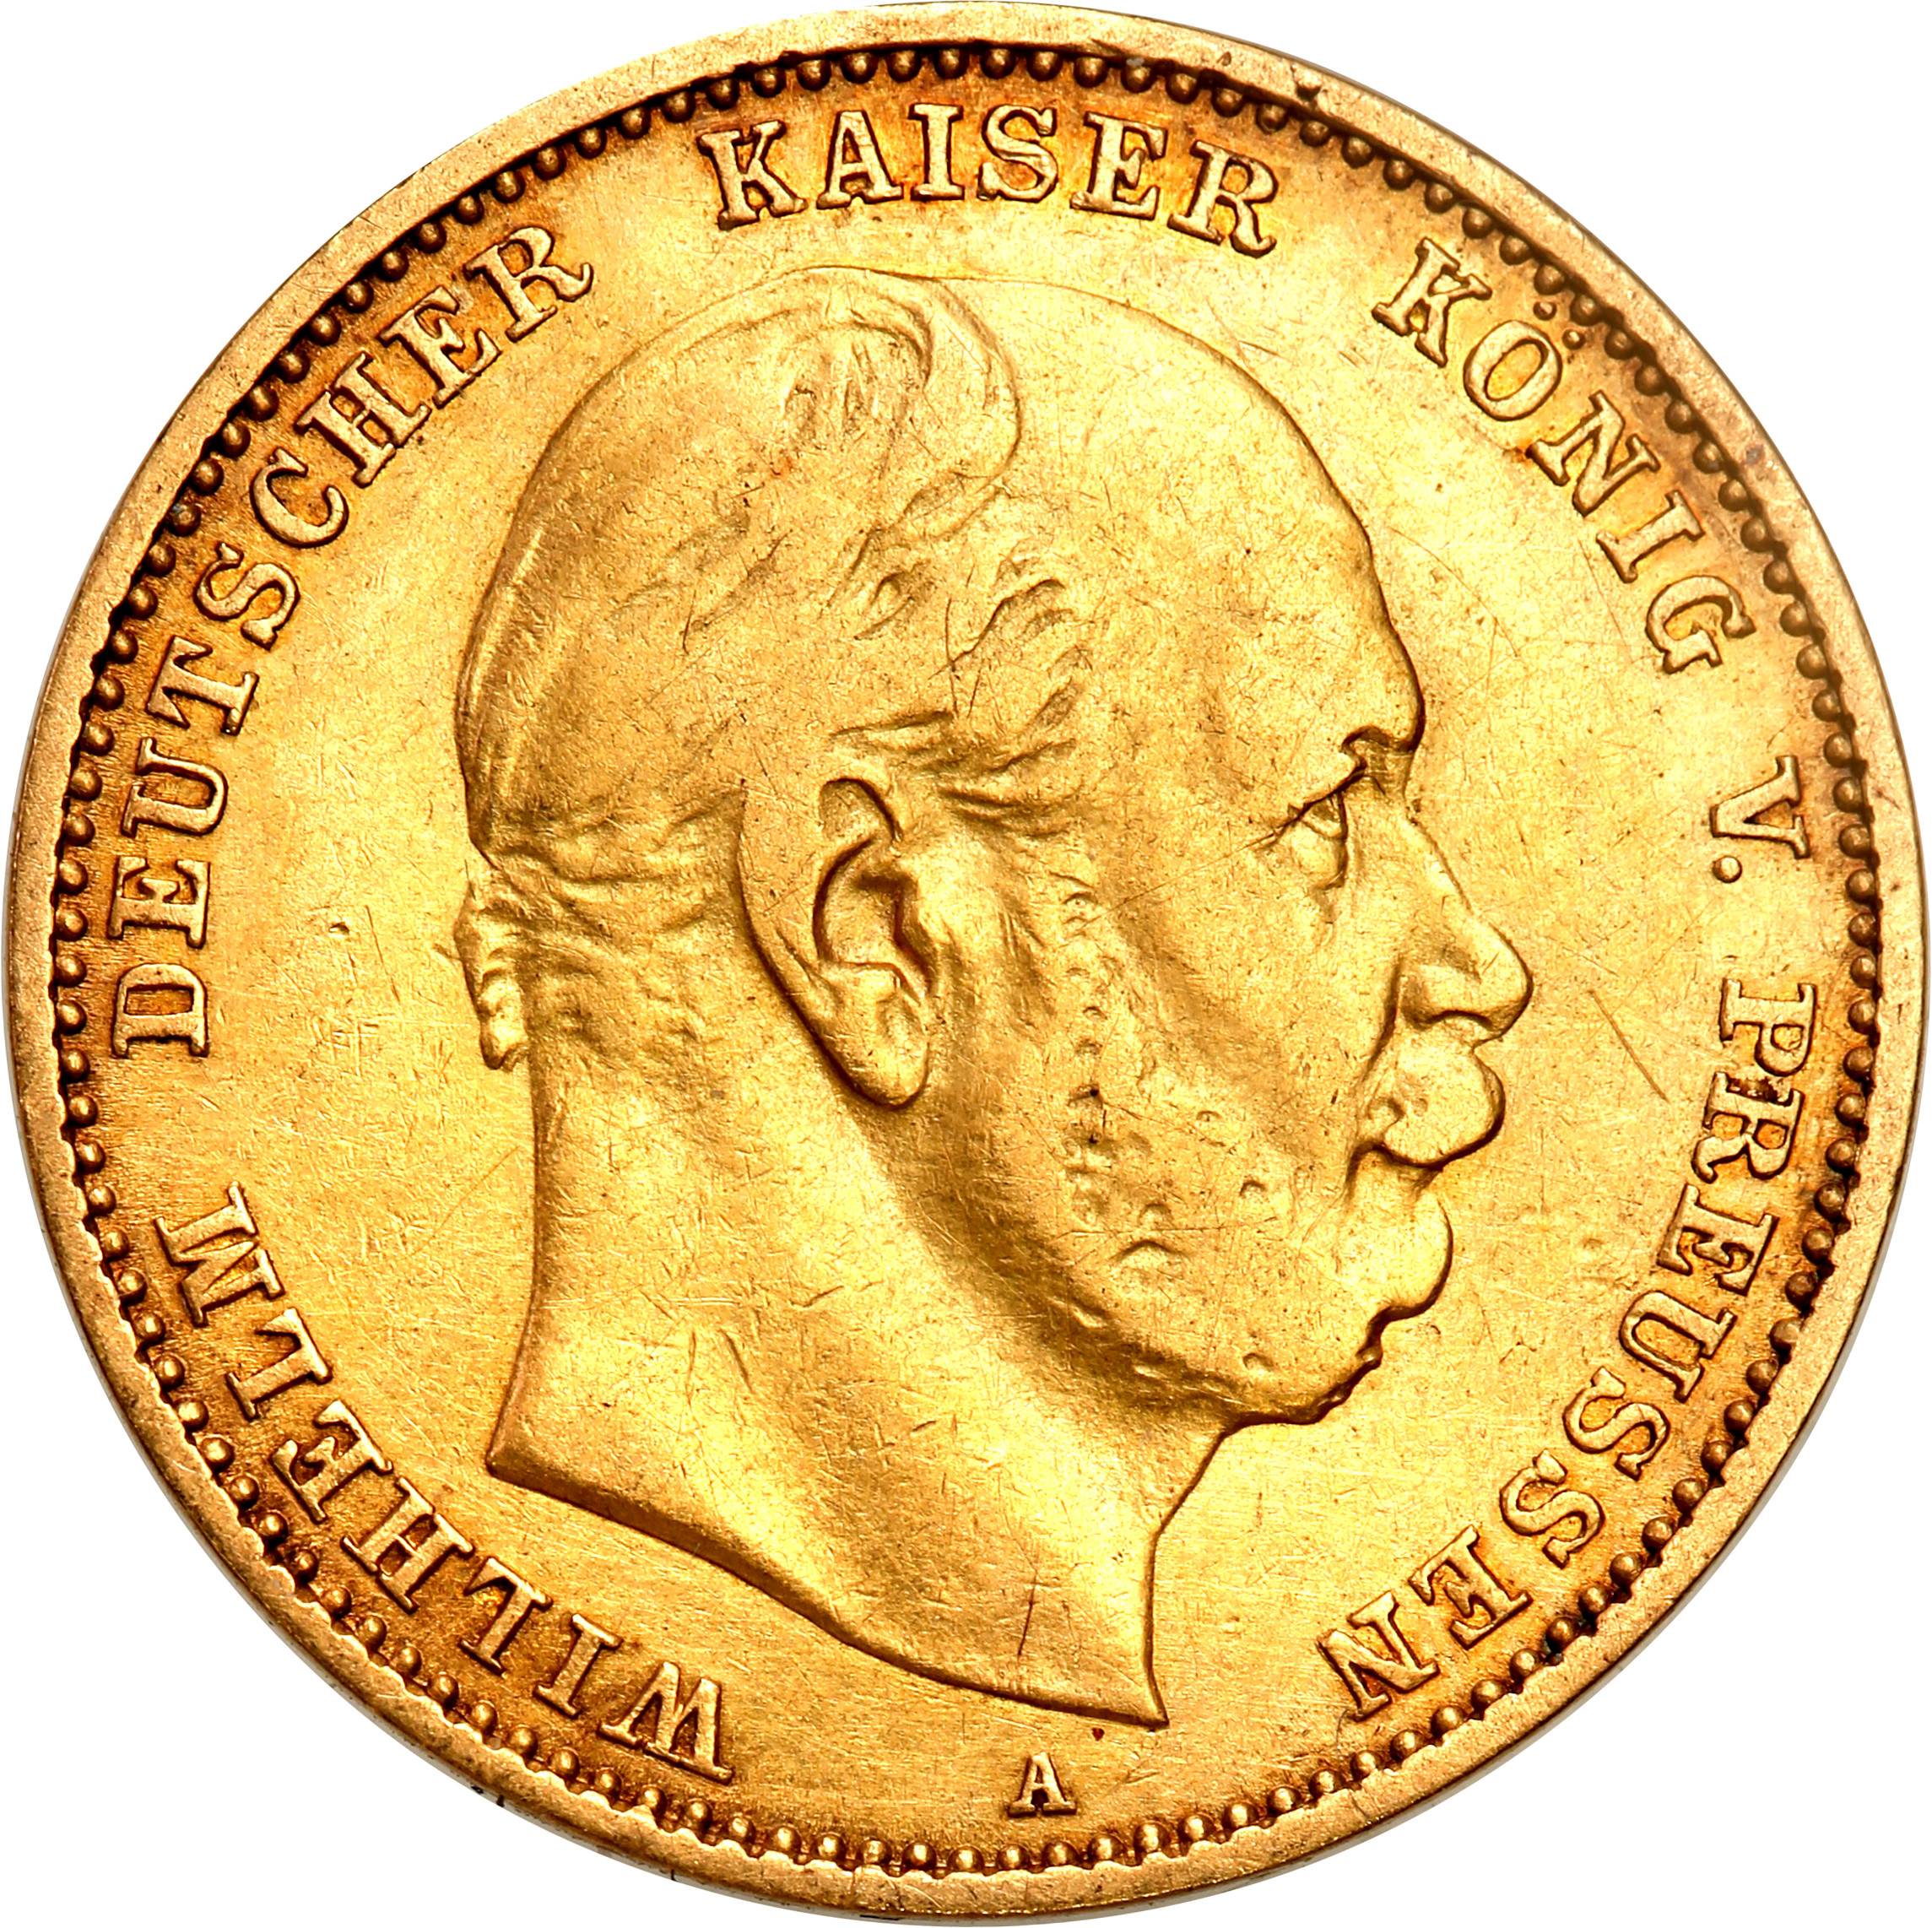 Niemcy Prusy 10 Marek 1880 A st.3+